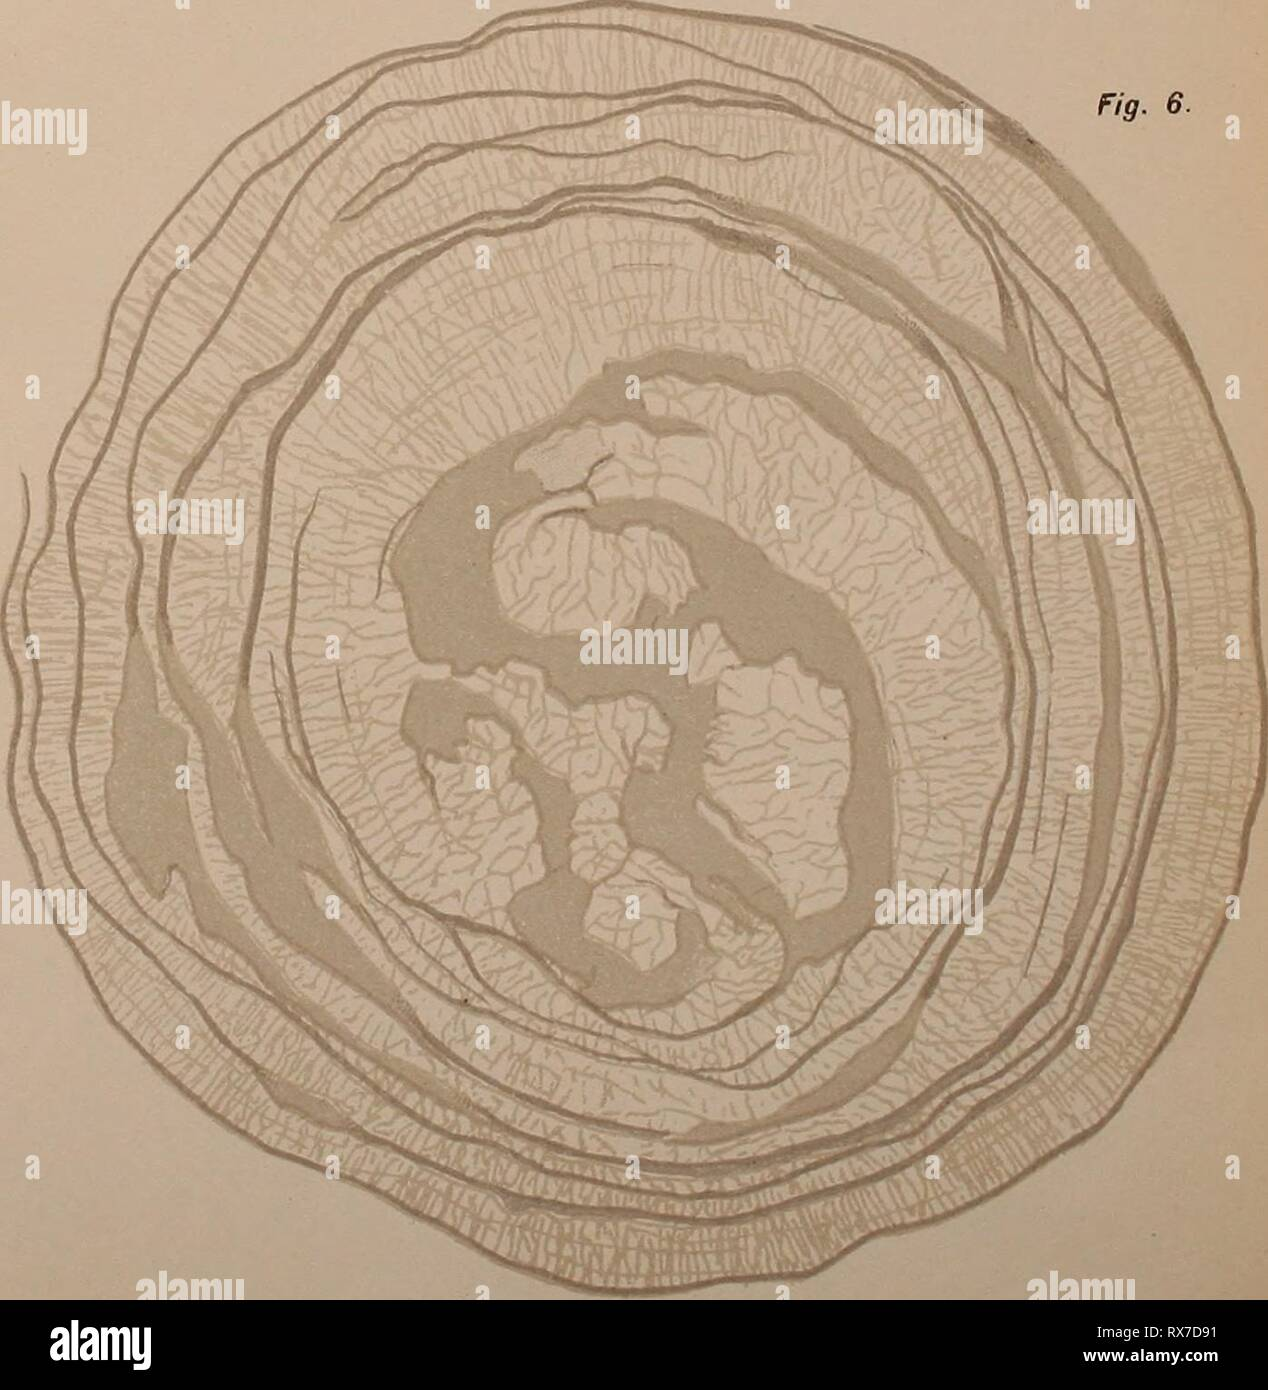 Eerste ontwikkelingsstadiën van Megalobatrachus maximus Eerste ontwikkelingsstadiÃ«n van Megalobatrachus maximus Schlegel eersteontwikkeli00buss Year: 1904  fi^- I, III, V, VI Mej. J.MÃteleekamp, del., fig- II en IV L. Â¥â de Bus3ï. del LHh. .1. H. 1»; Br; - Stock Image